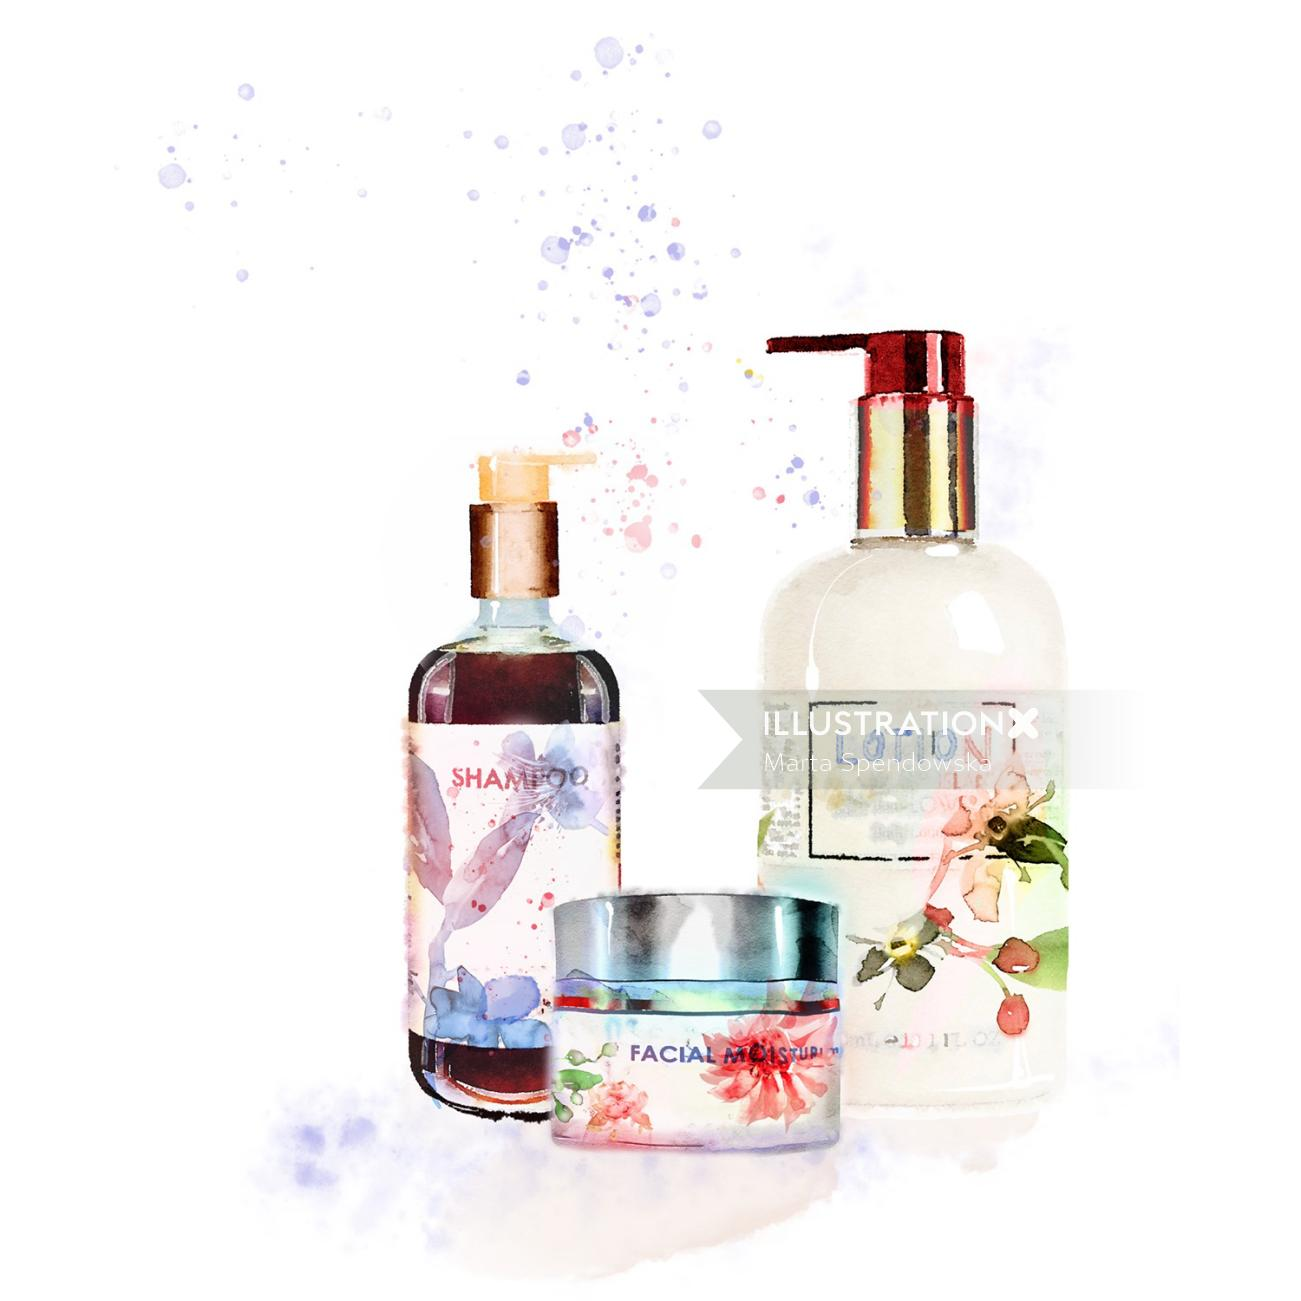 Shampoo bottles painting by Marta Spendowska